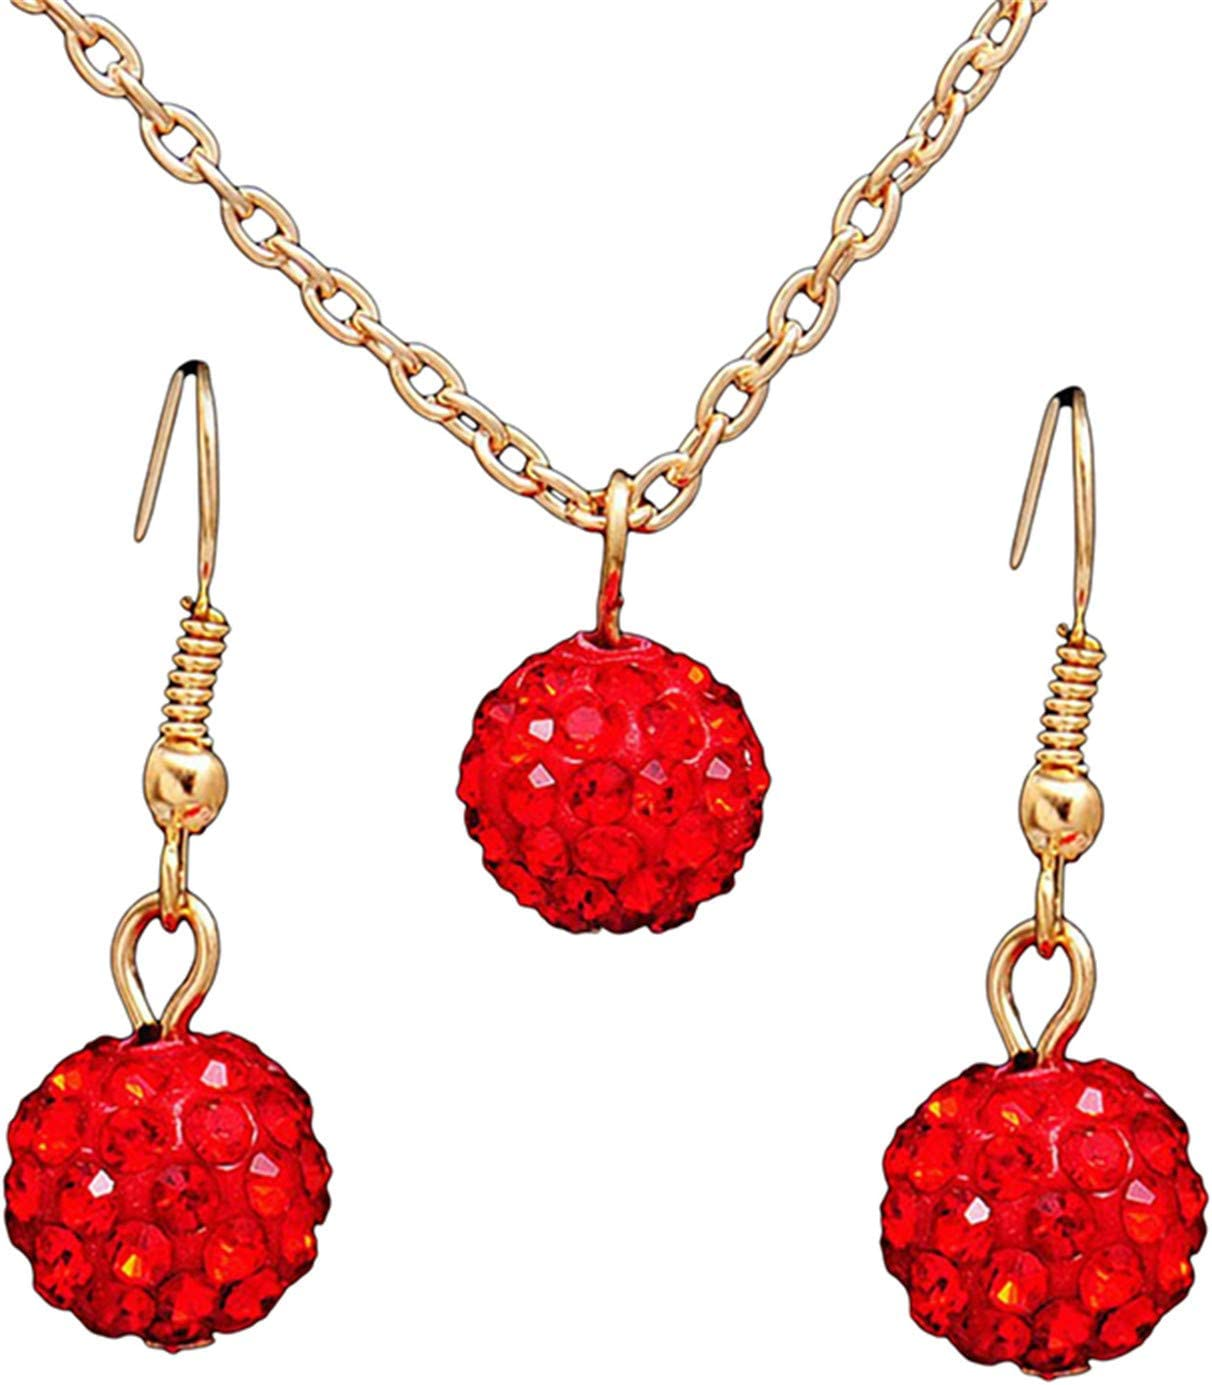 WEILYDF 2 Pcs/Set Chain Ball Shape Rhinestone Pendant Necklace Earrings Set Ethnic Style Wedding Birthday Jewelry Gift for Women,Red